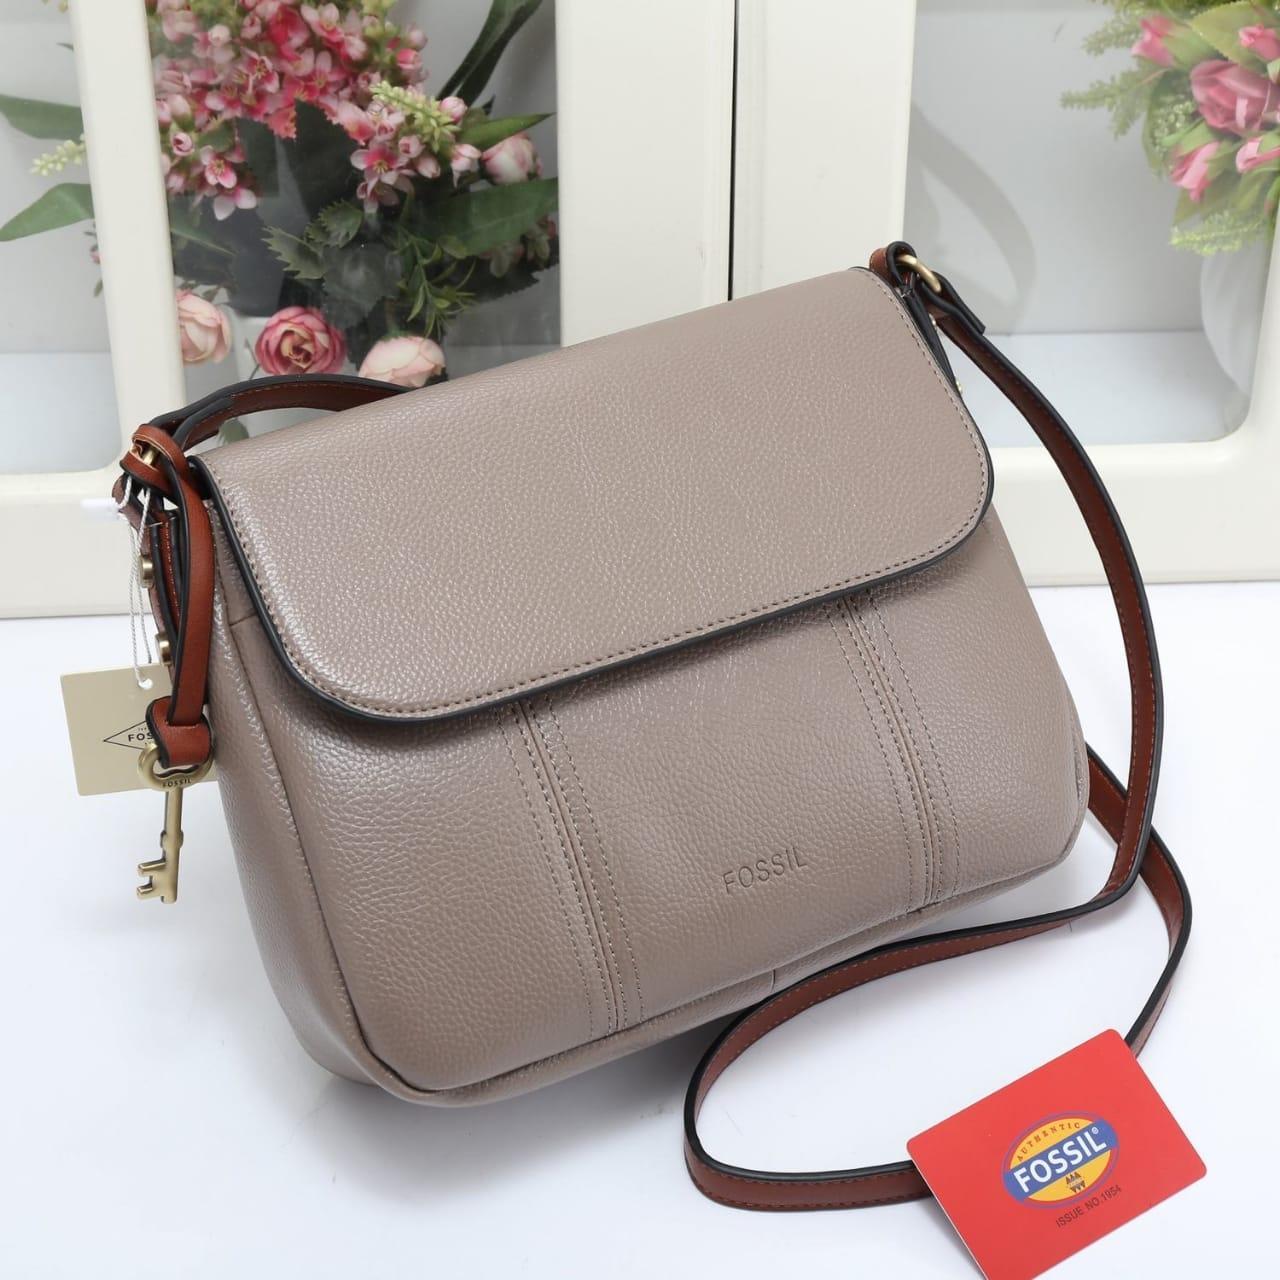 Tas wanita Fossil branded   cewek kerja terbaru   fashion import batam  diskon hot item selempang 998585a678